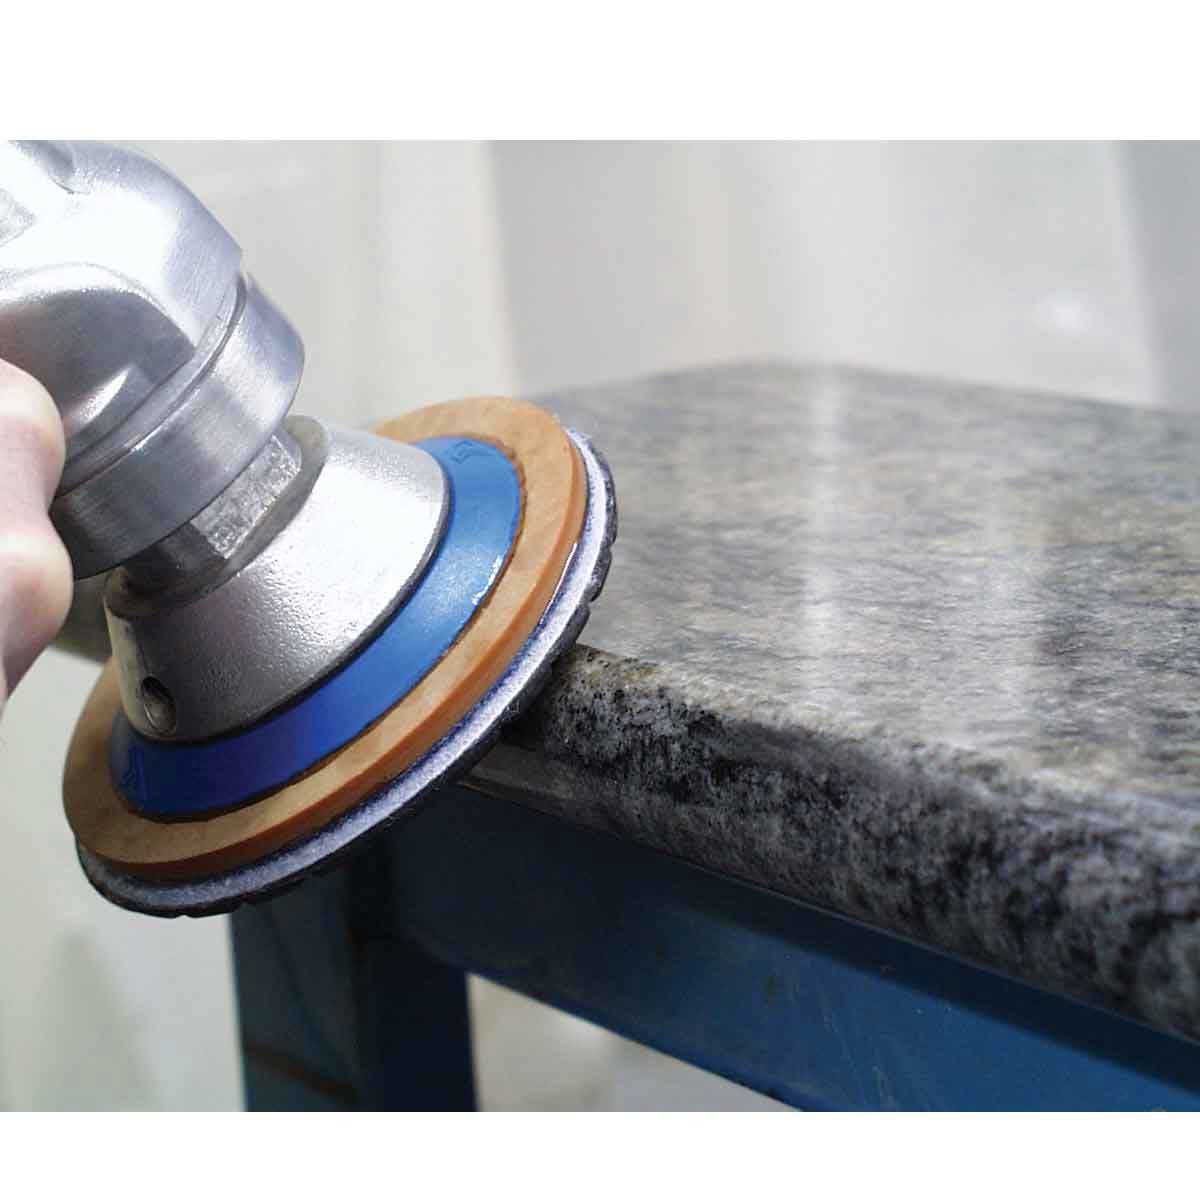 GP43000R 3000 Grit Wet Stone Pads